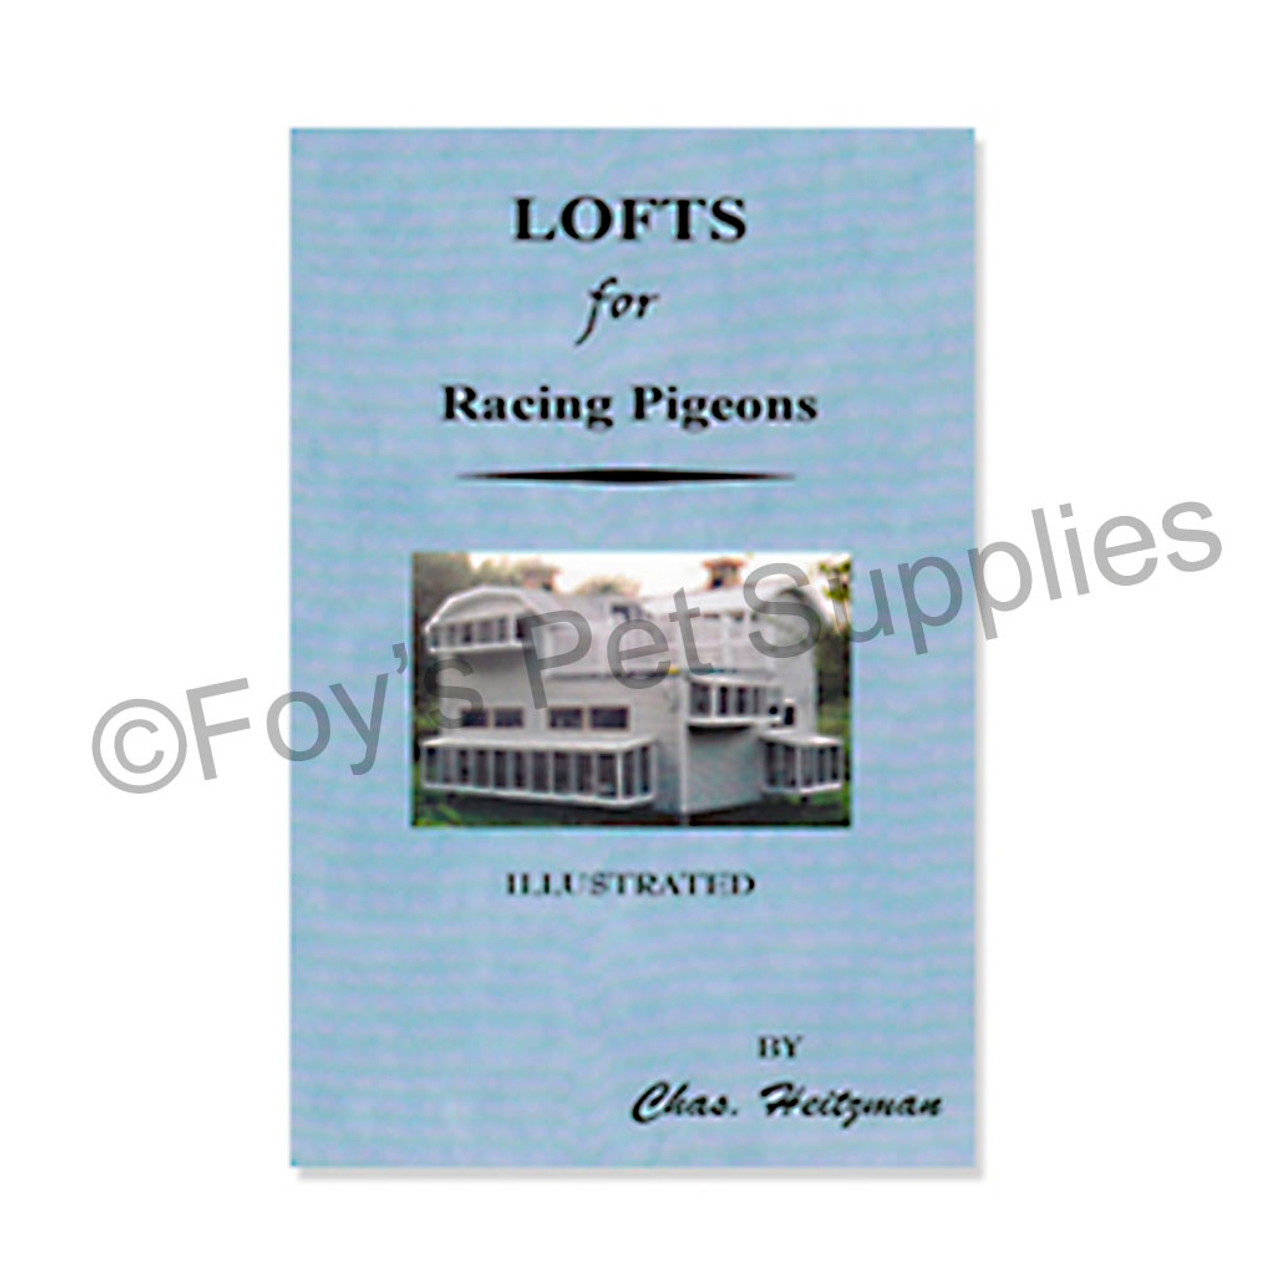 Lofts for Racing Pigeons